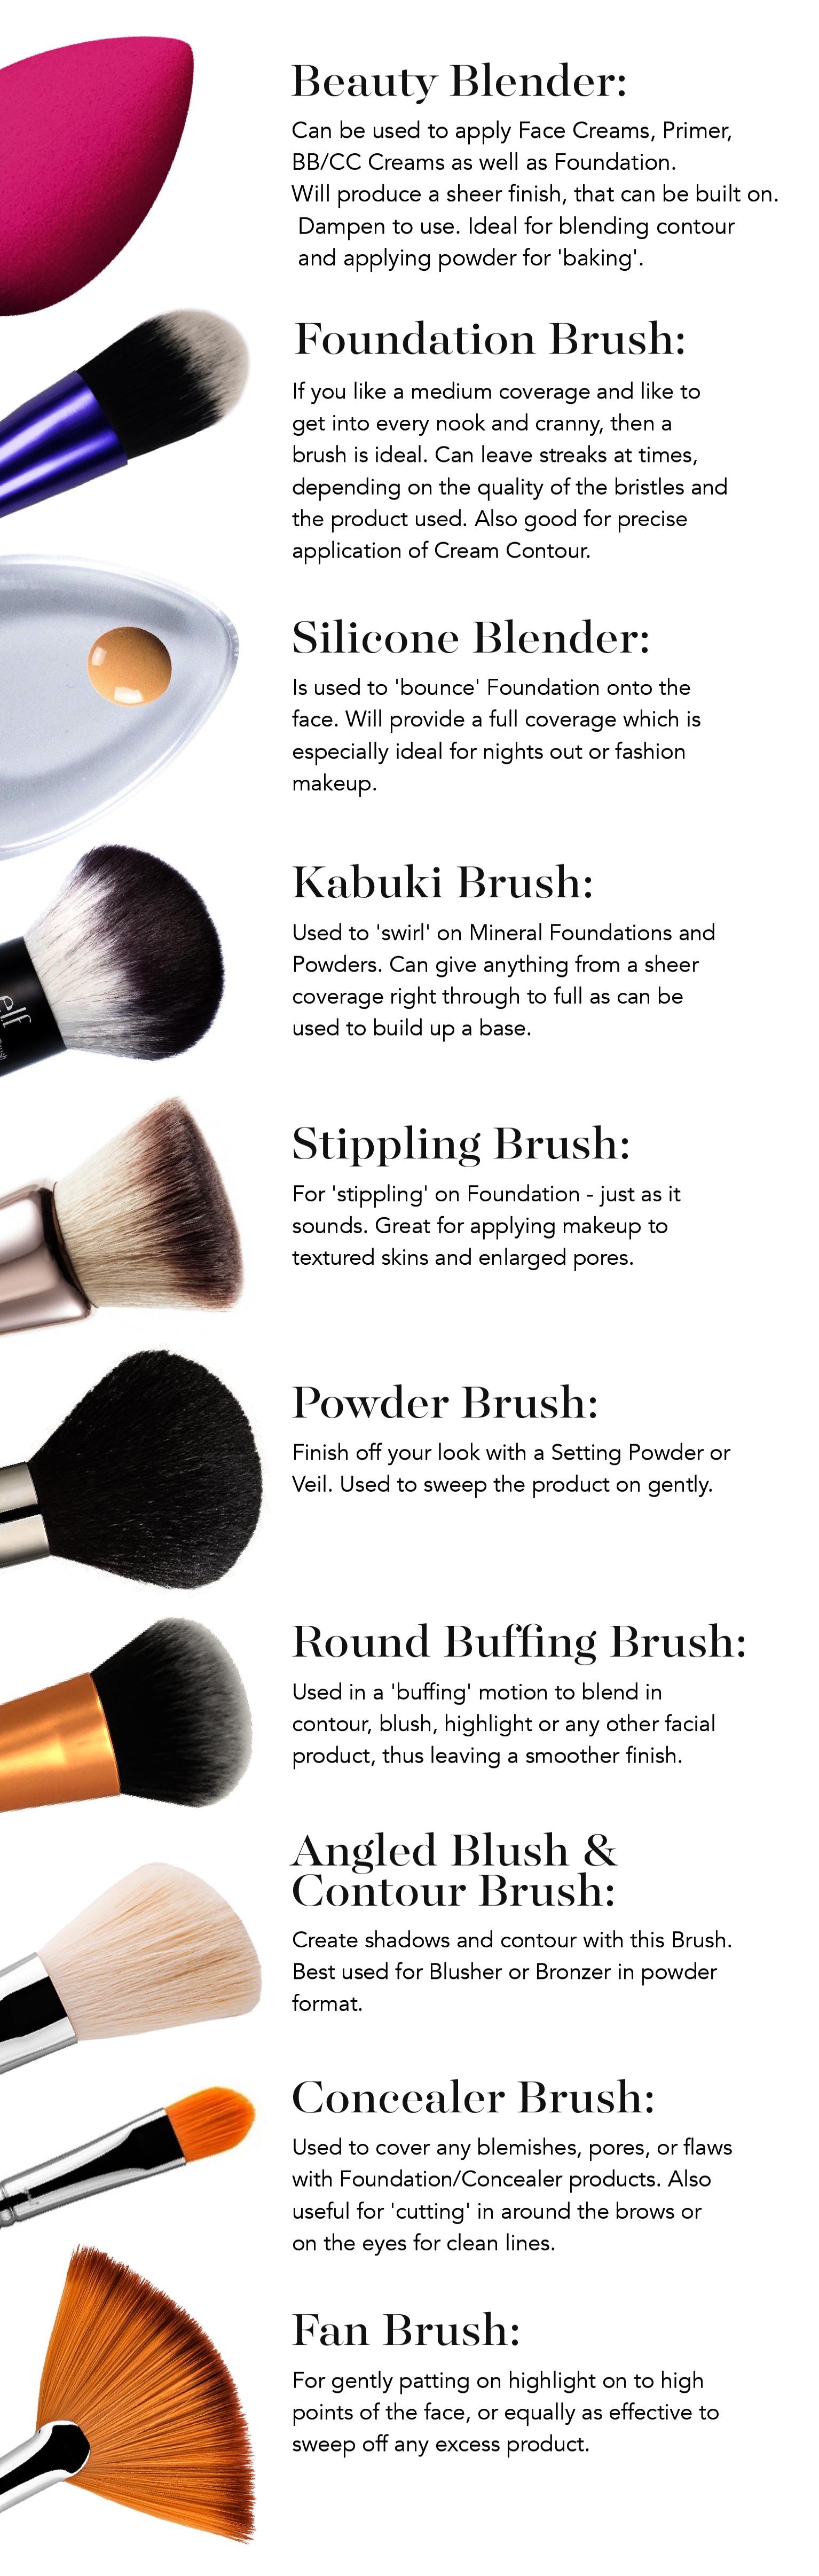 Japonesque Makeup Brush Cleaner Review Makeup Brush